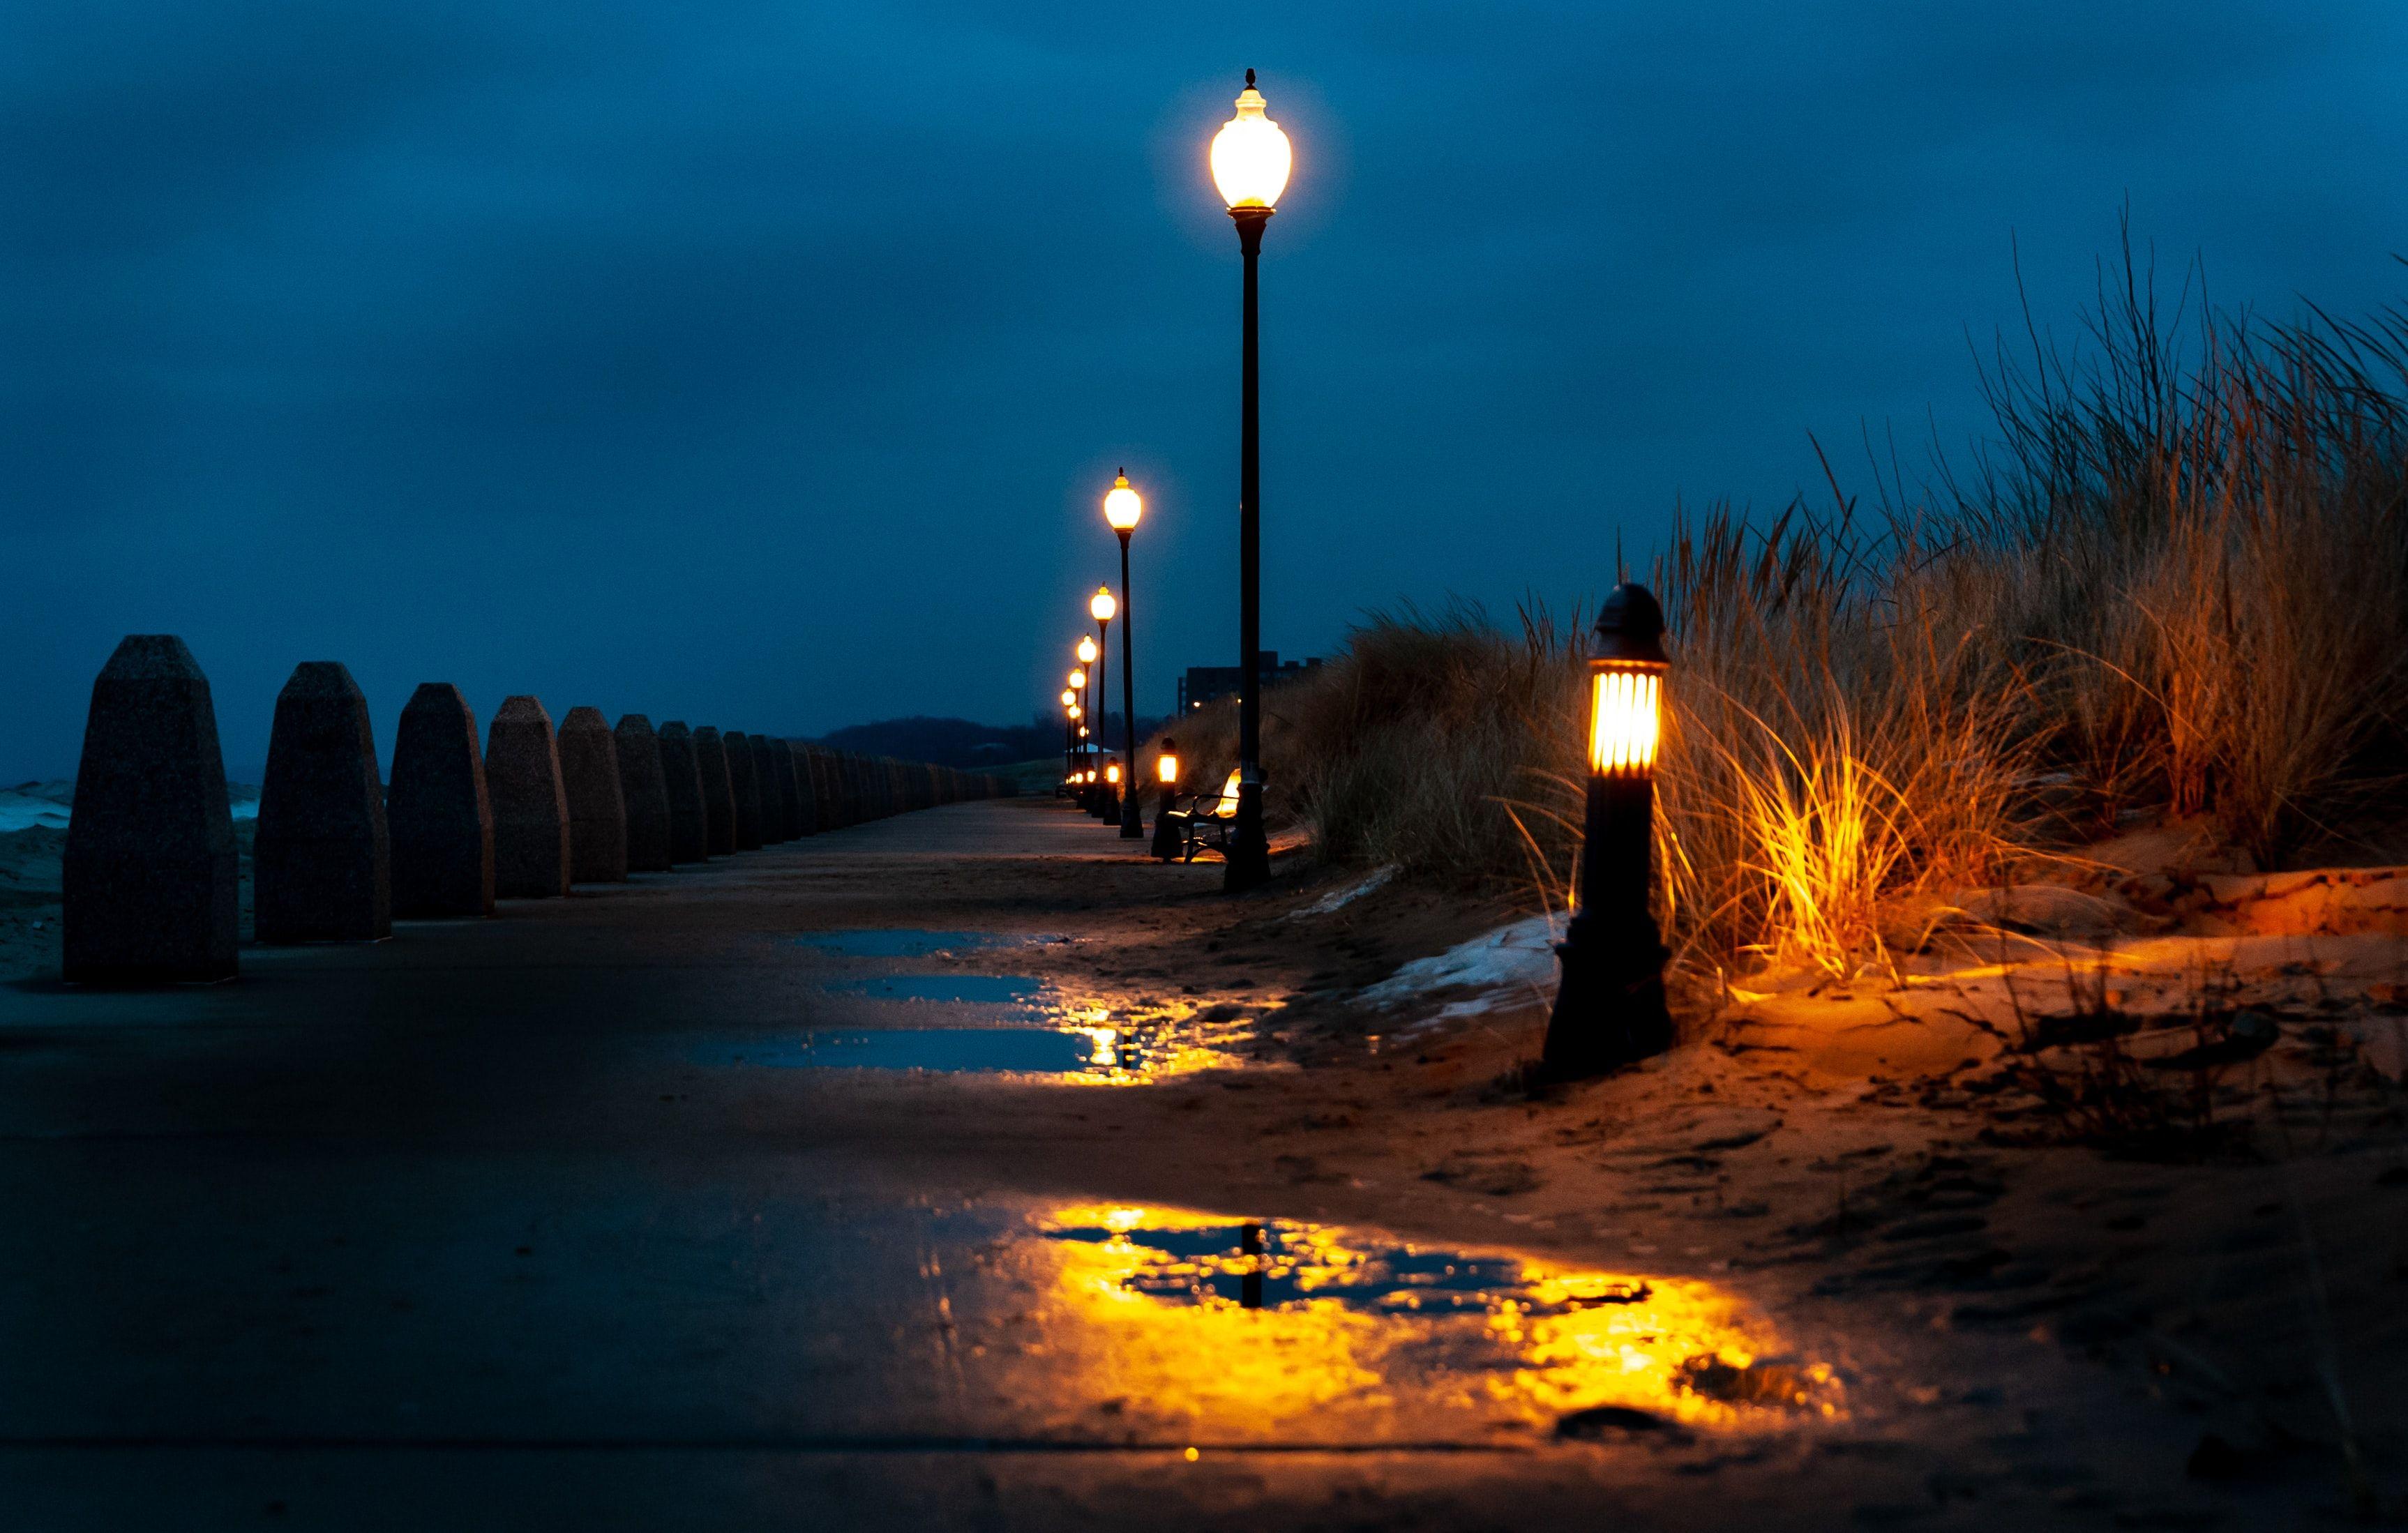 Street Light Turned On During Nighttime Street Light Night Time